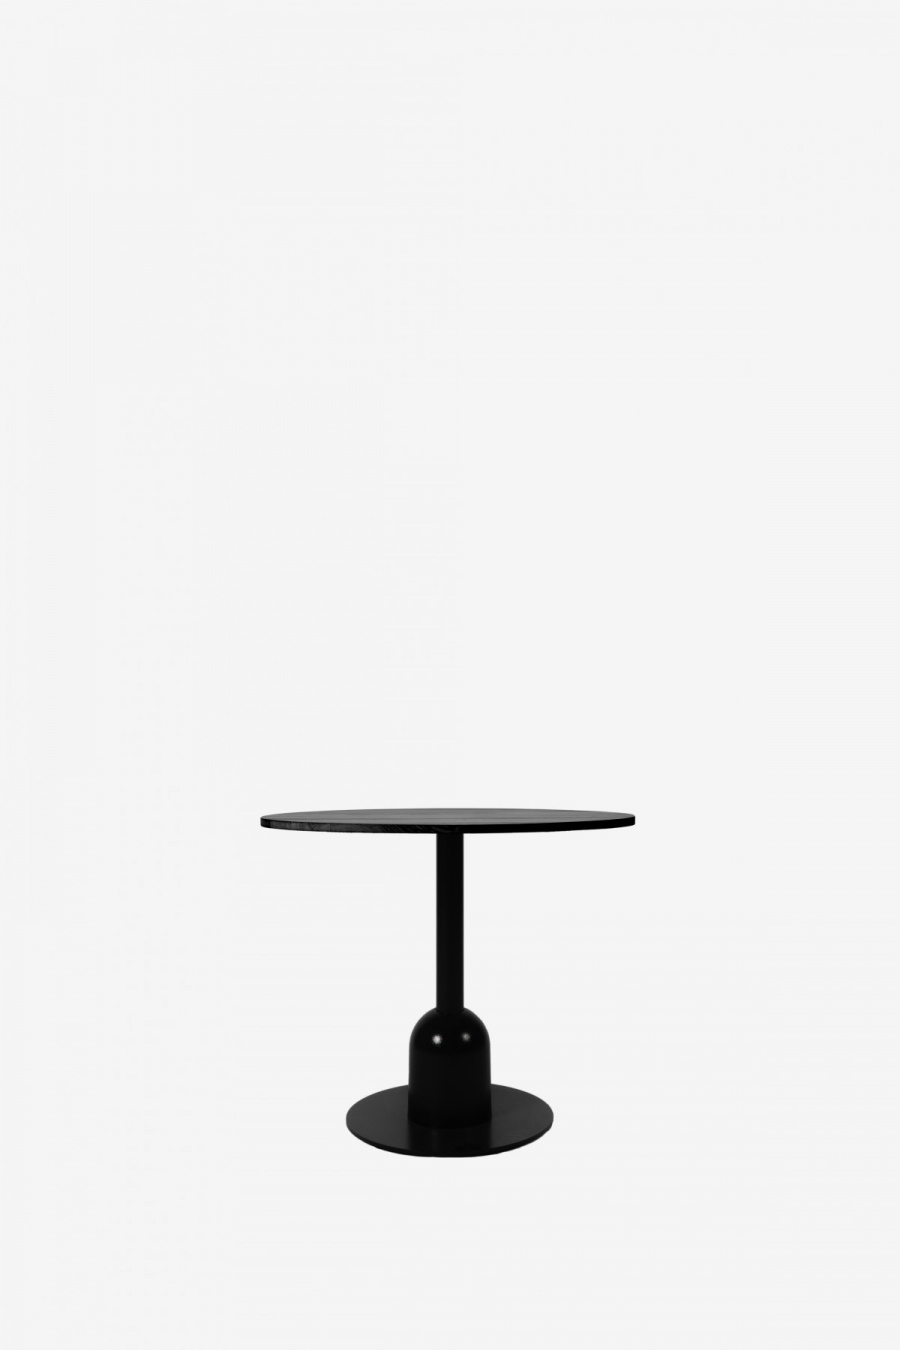 Vincent Sheppard - Eettafels - Charlie bistro tafel